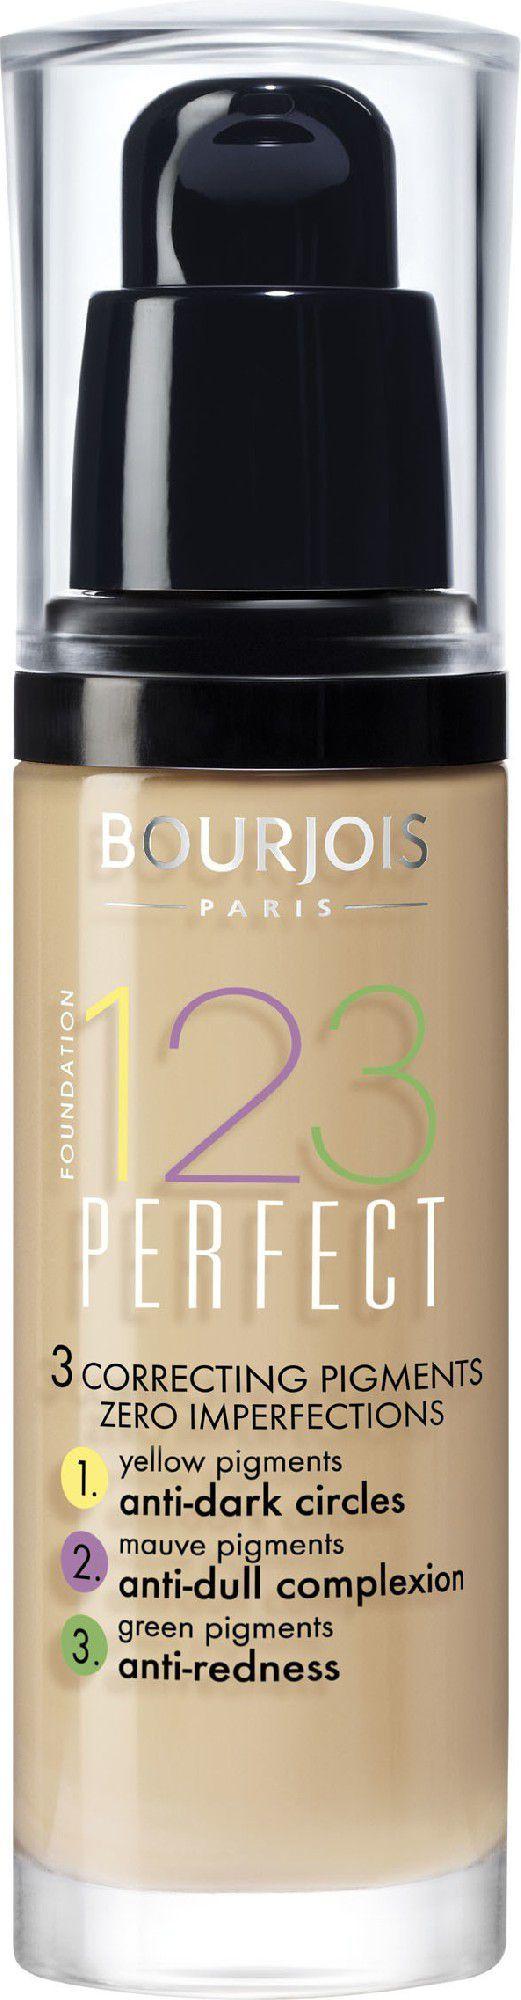 BOURJOIS Paris 123 Perfect Foundation 16 Hour 54 Beige 30ml 1